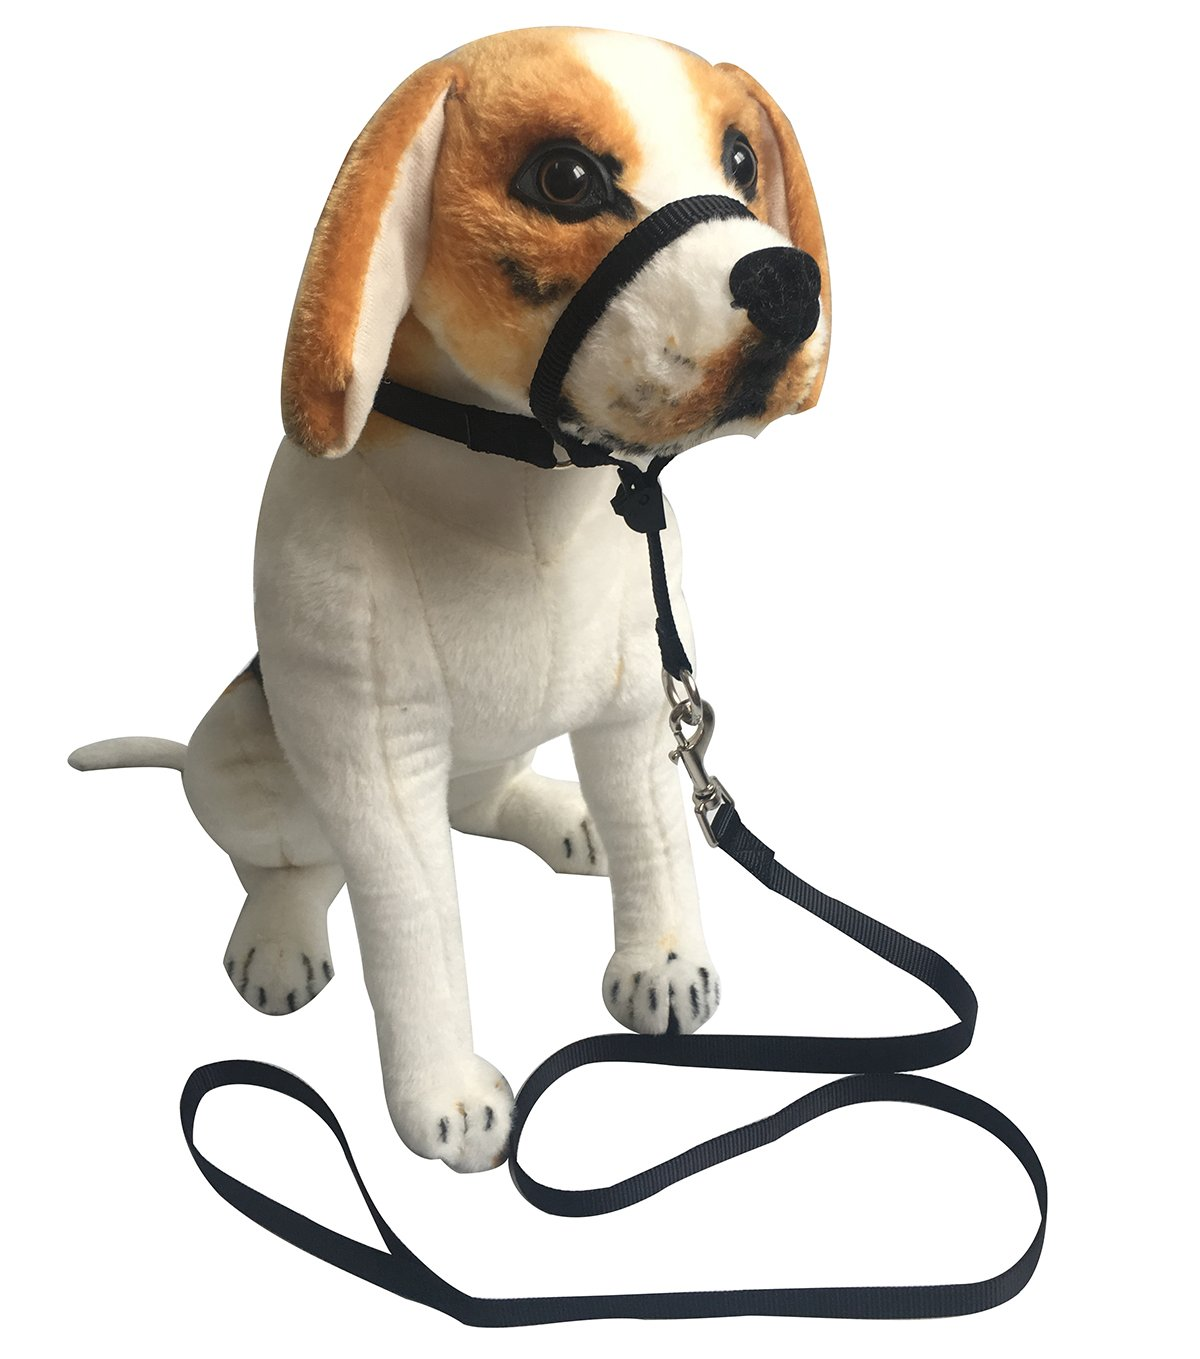 Headcollar Halter Painless Gentle Control Training Collars with Leash (M, Black)